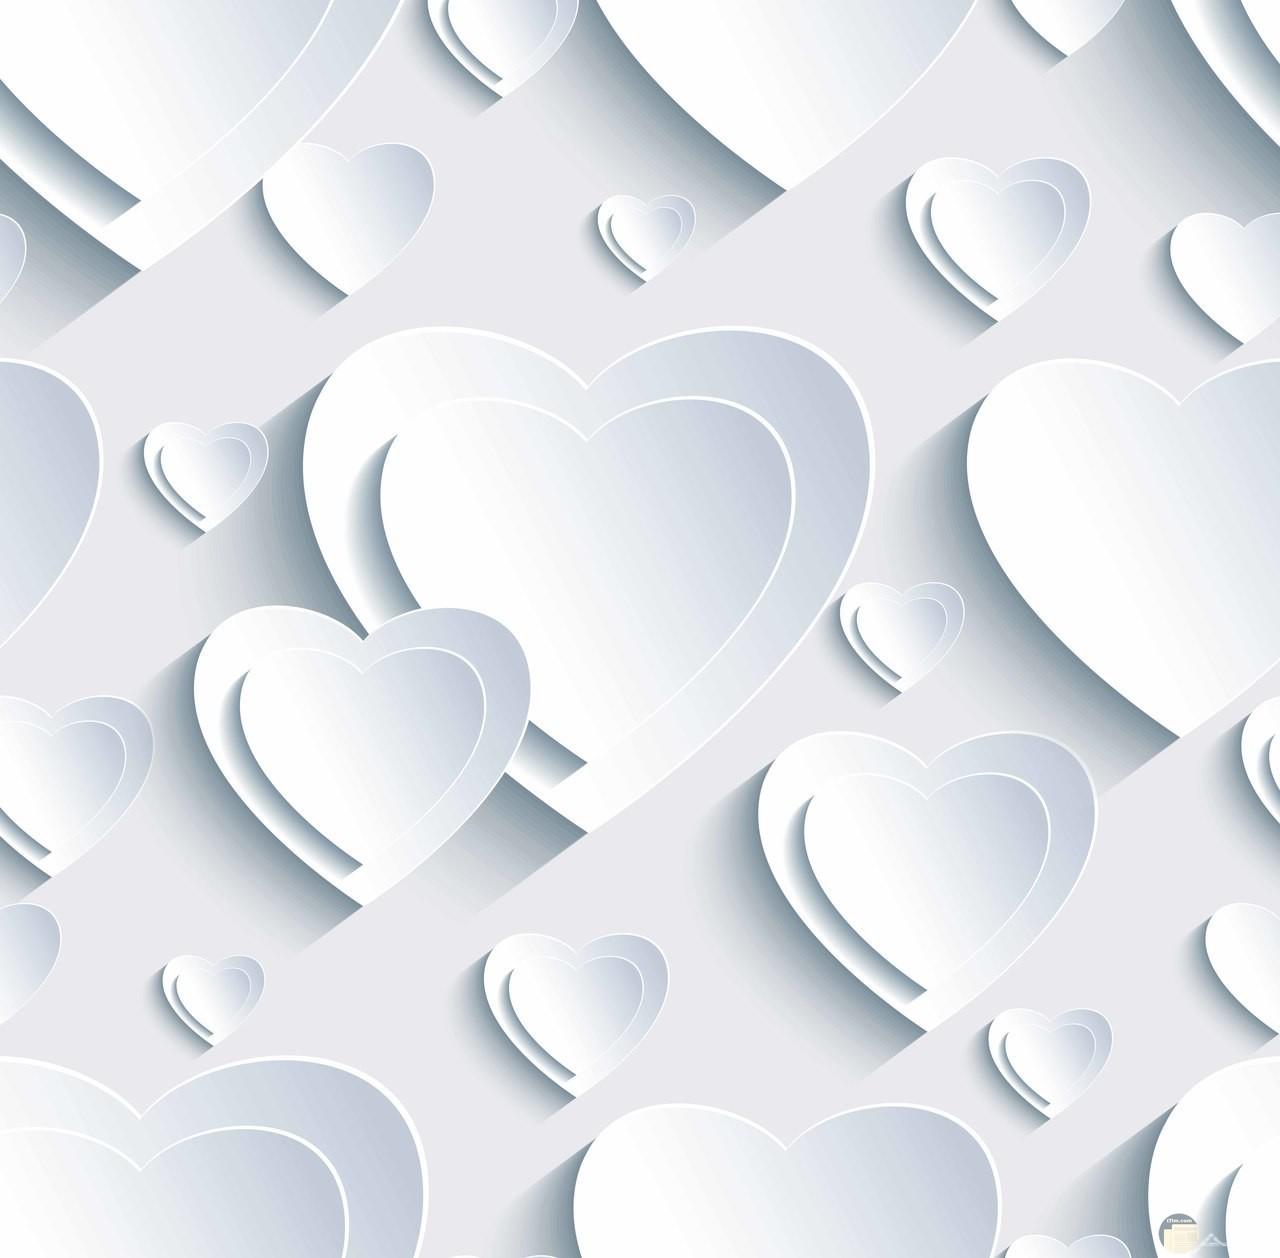 قلوب بيضاء 3D